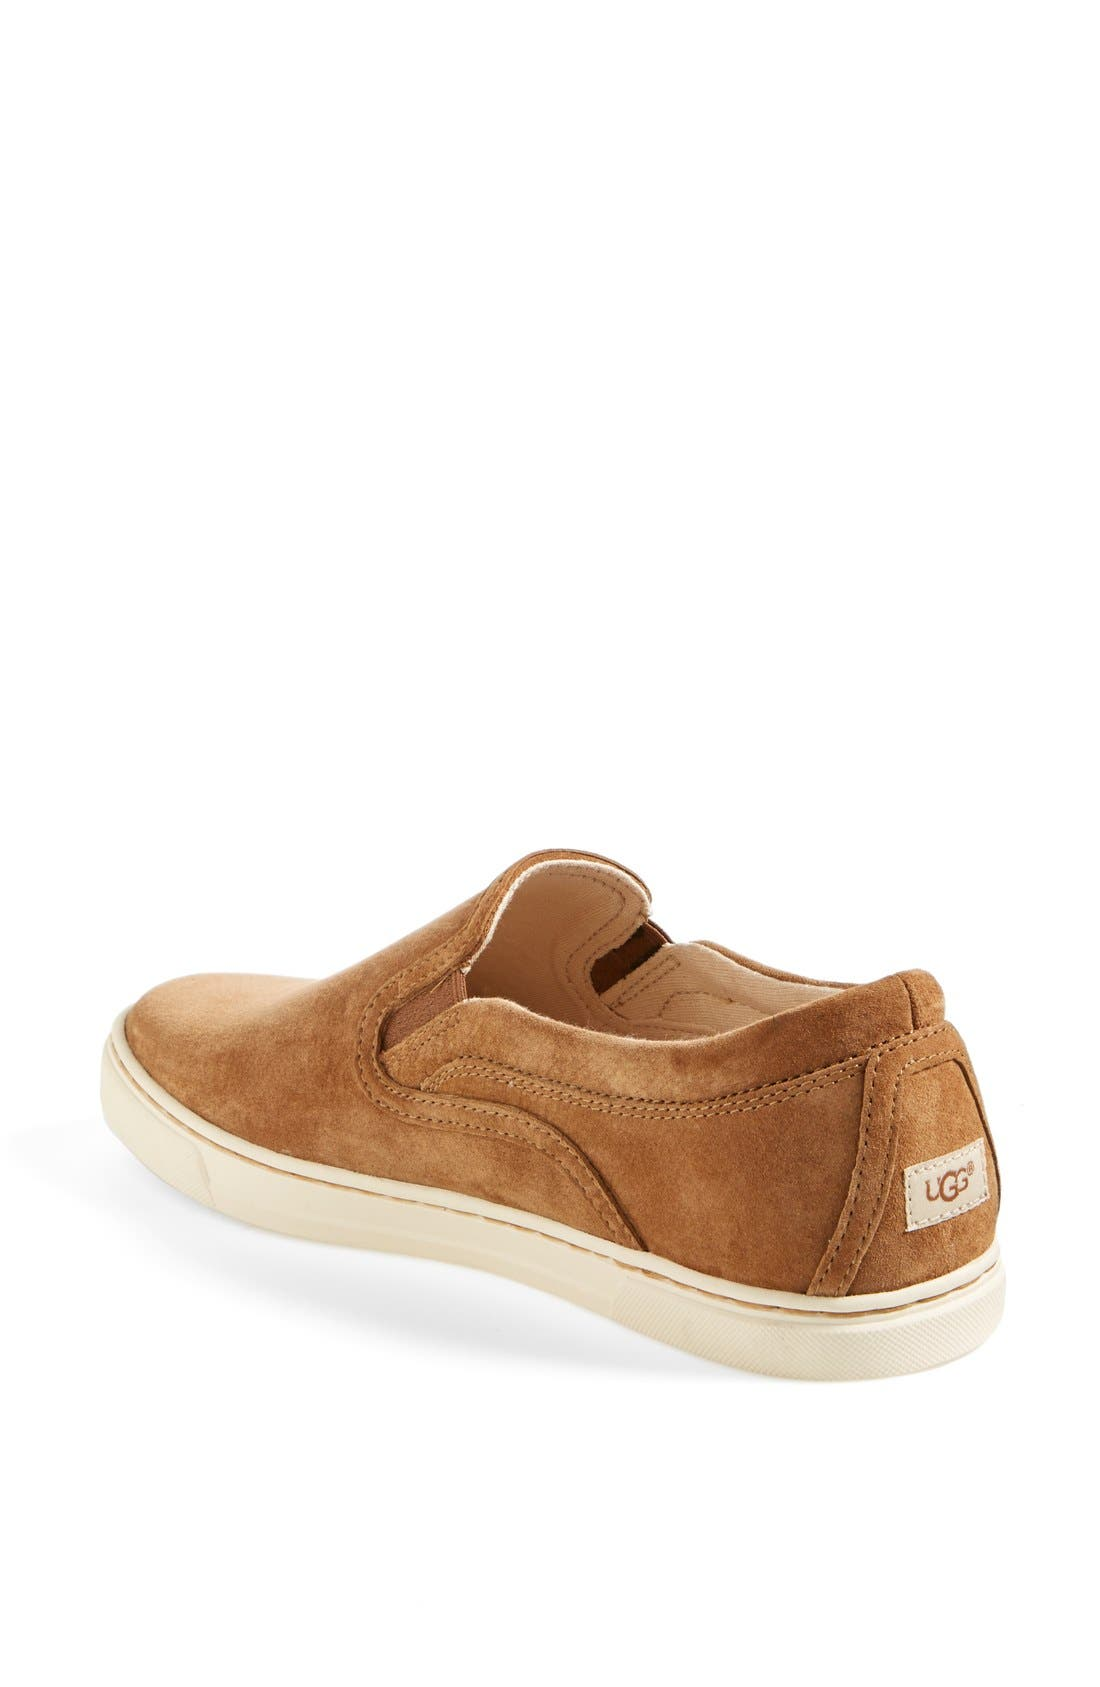 Alternate Image 2  - UGG® Fierce Water Resistant Suede Slip-On Sneaker (Nordstrom Exclusive Color) (Women)